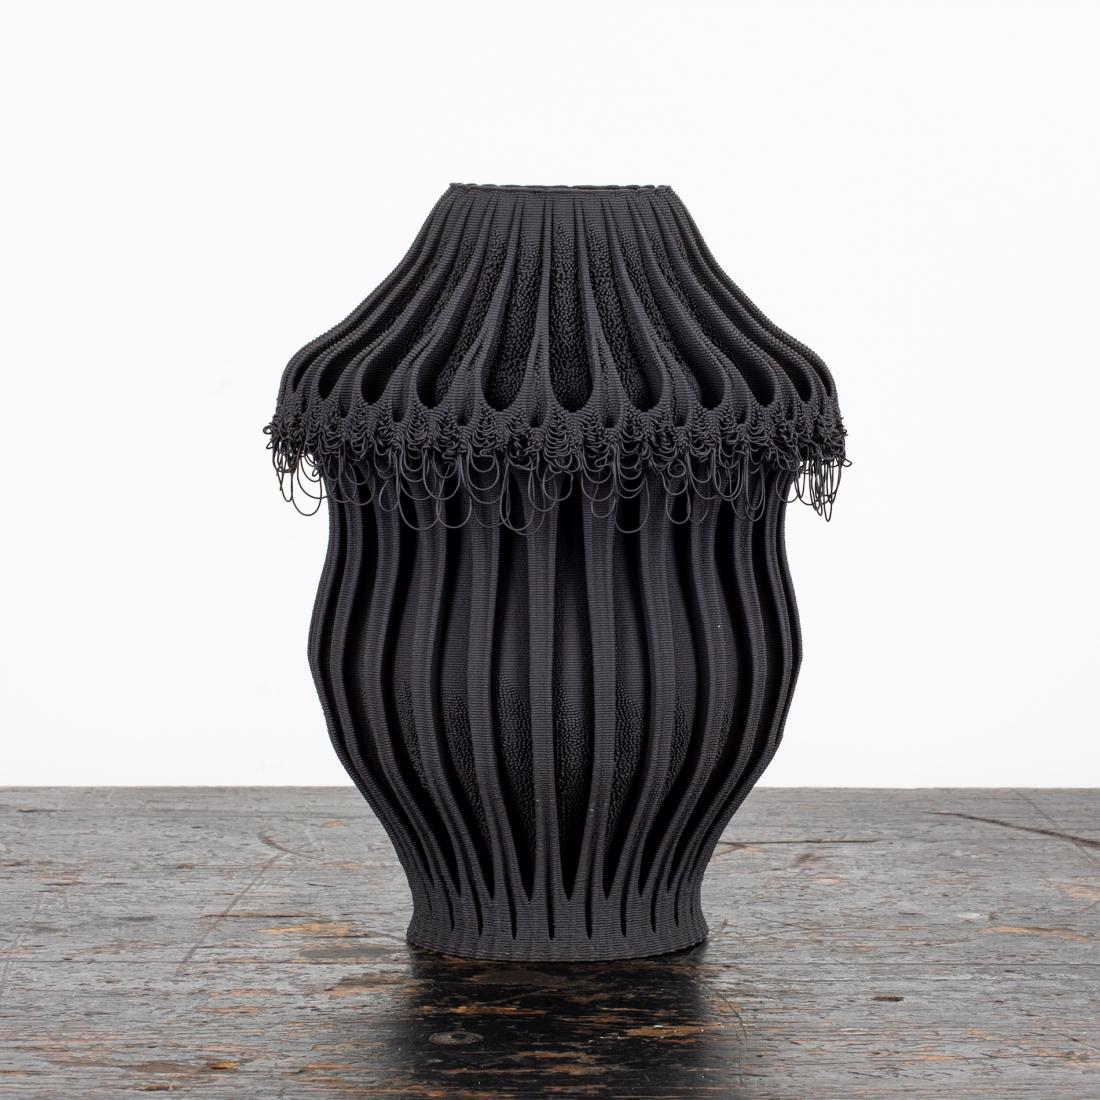 Nico Conti - black porcelain 3D printed vase